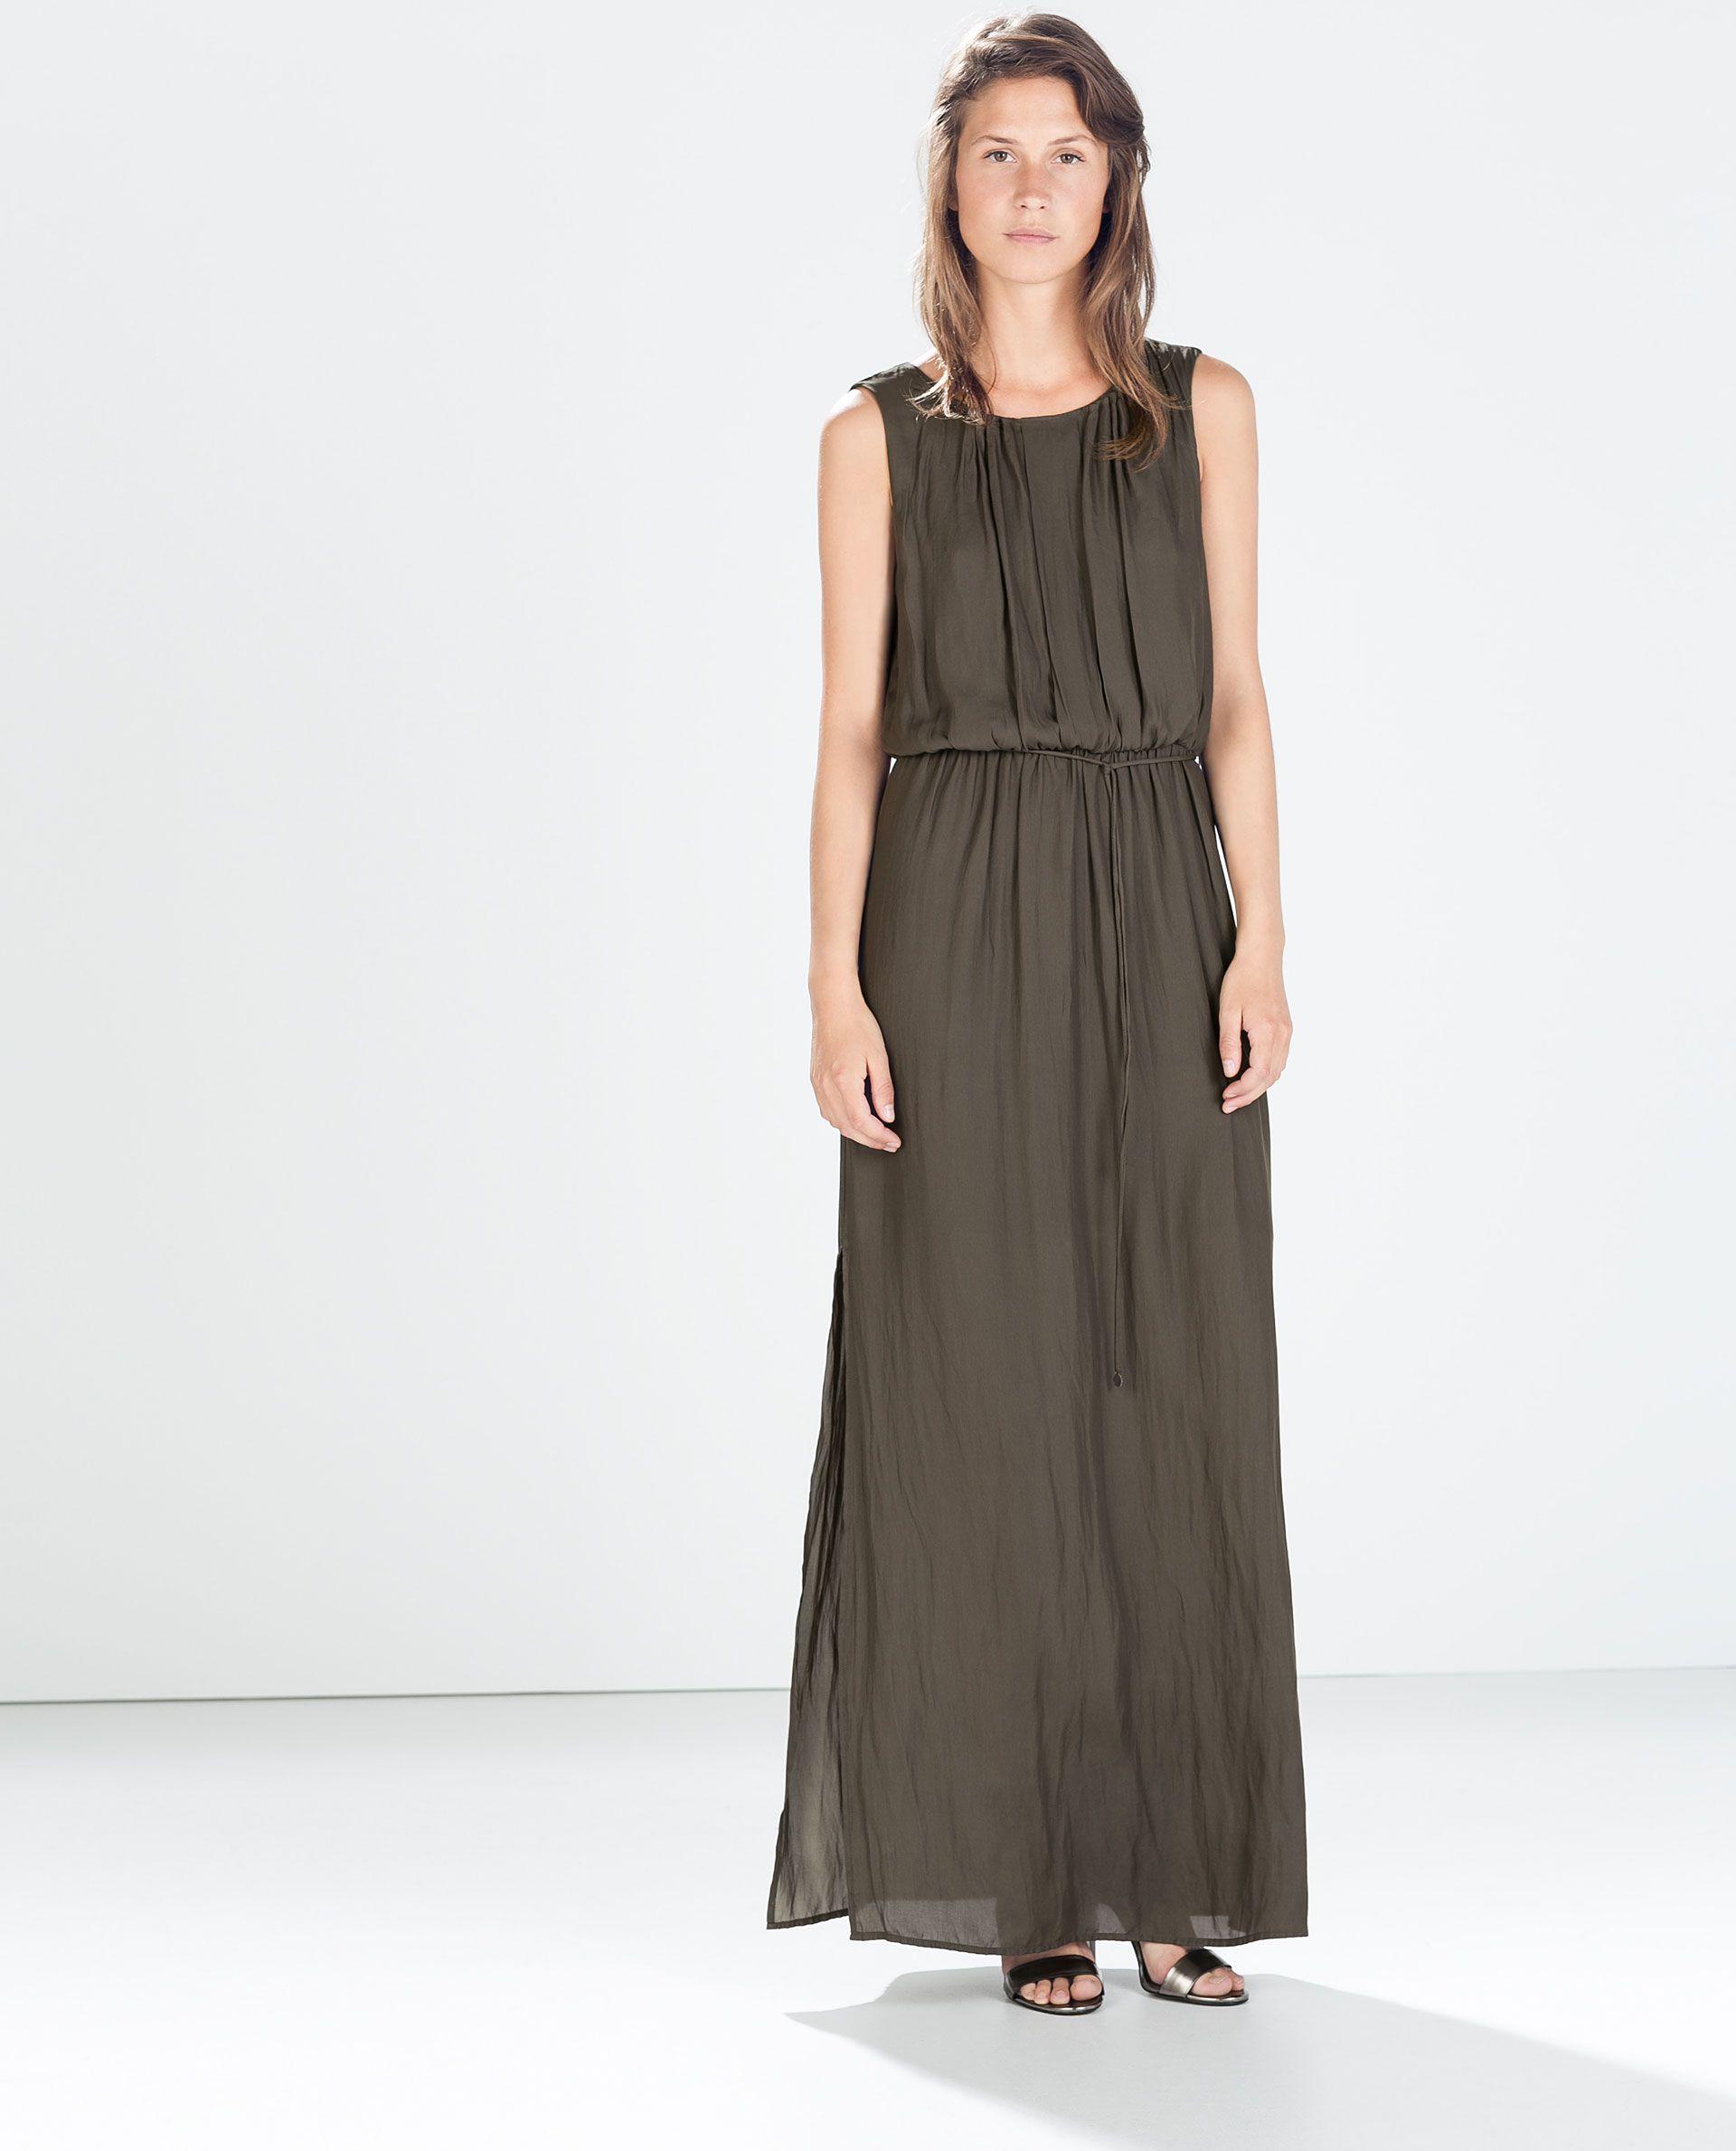 Pleated low cut maxi dress 7999 httpzarausenwoman vestido largo gasa zara bomber dress up ispan ombrellifo Image collections